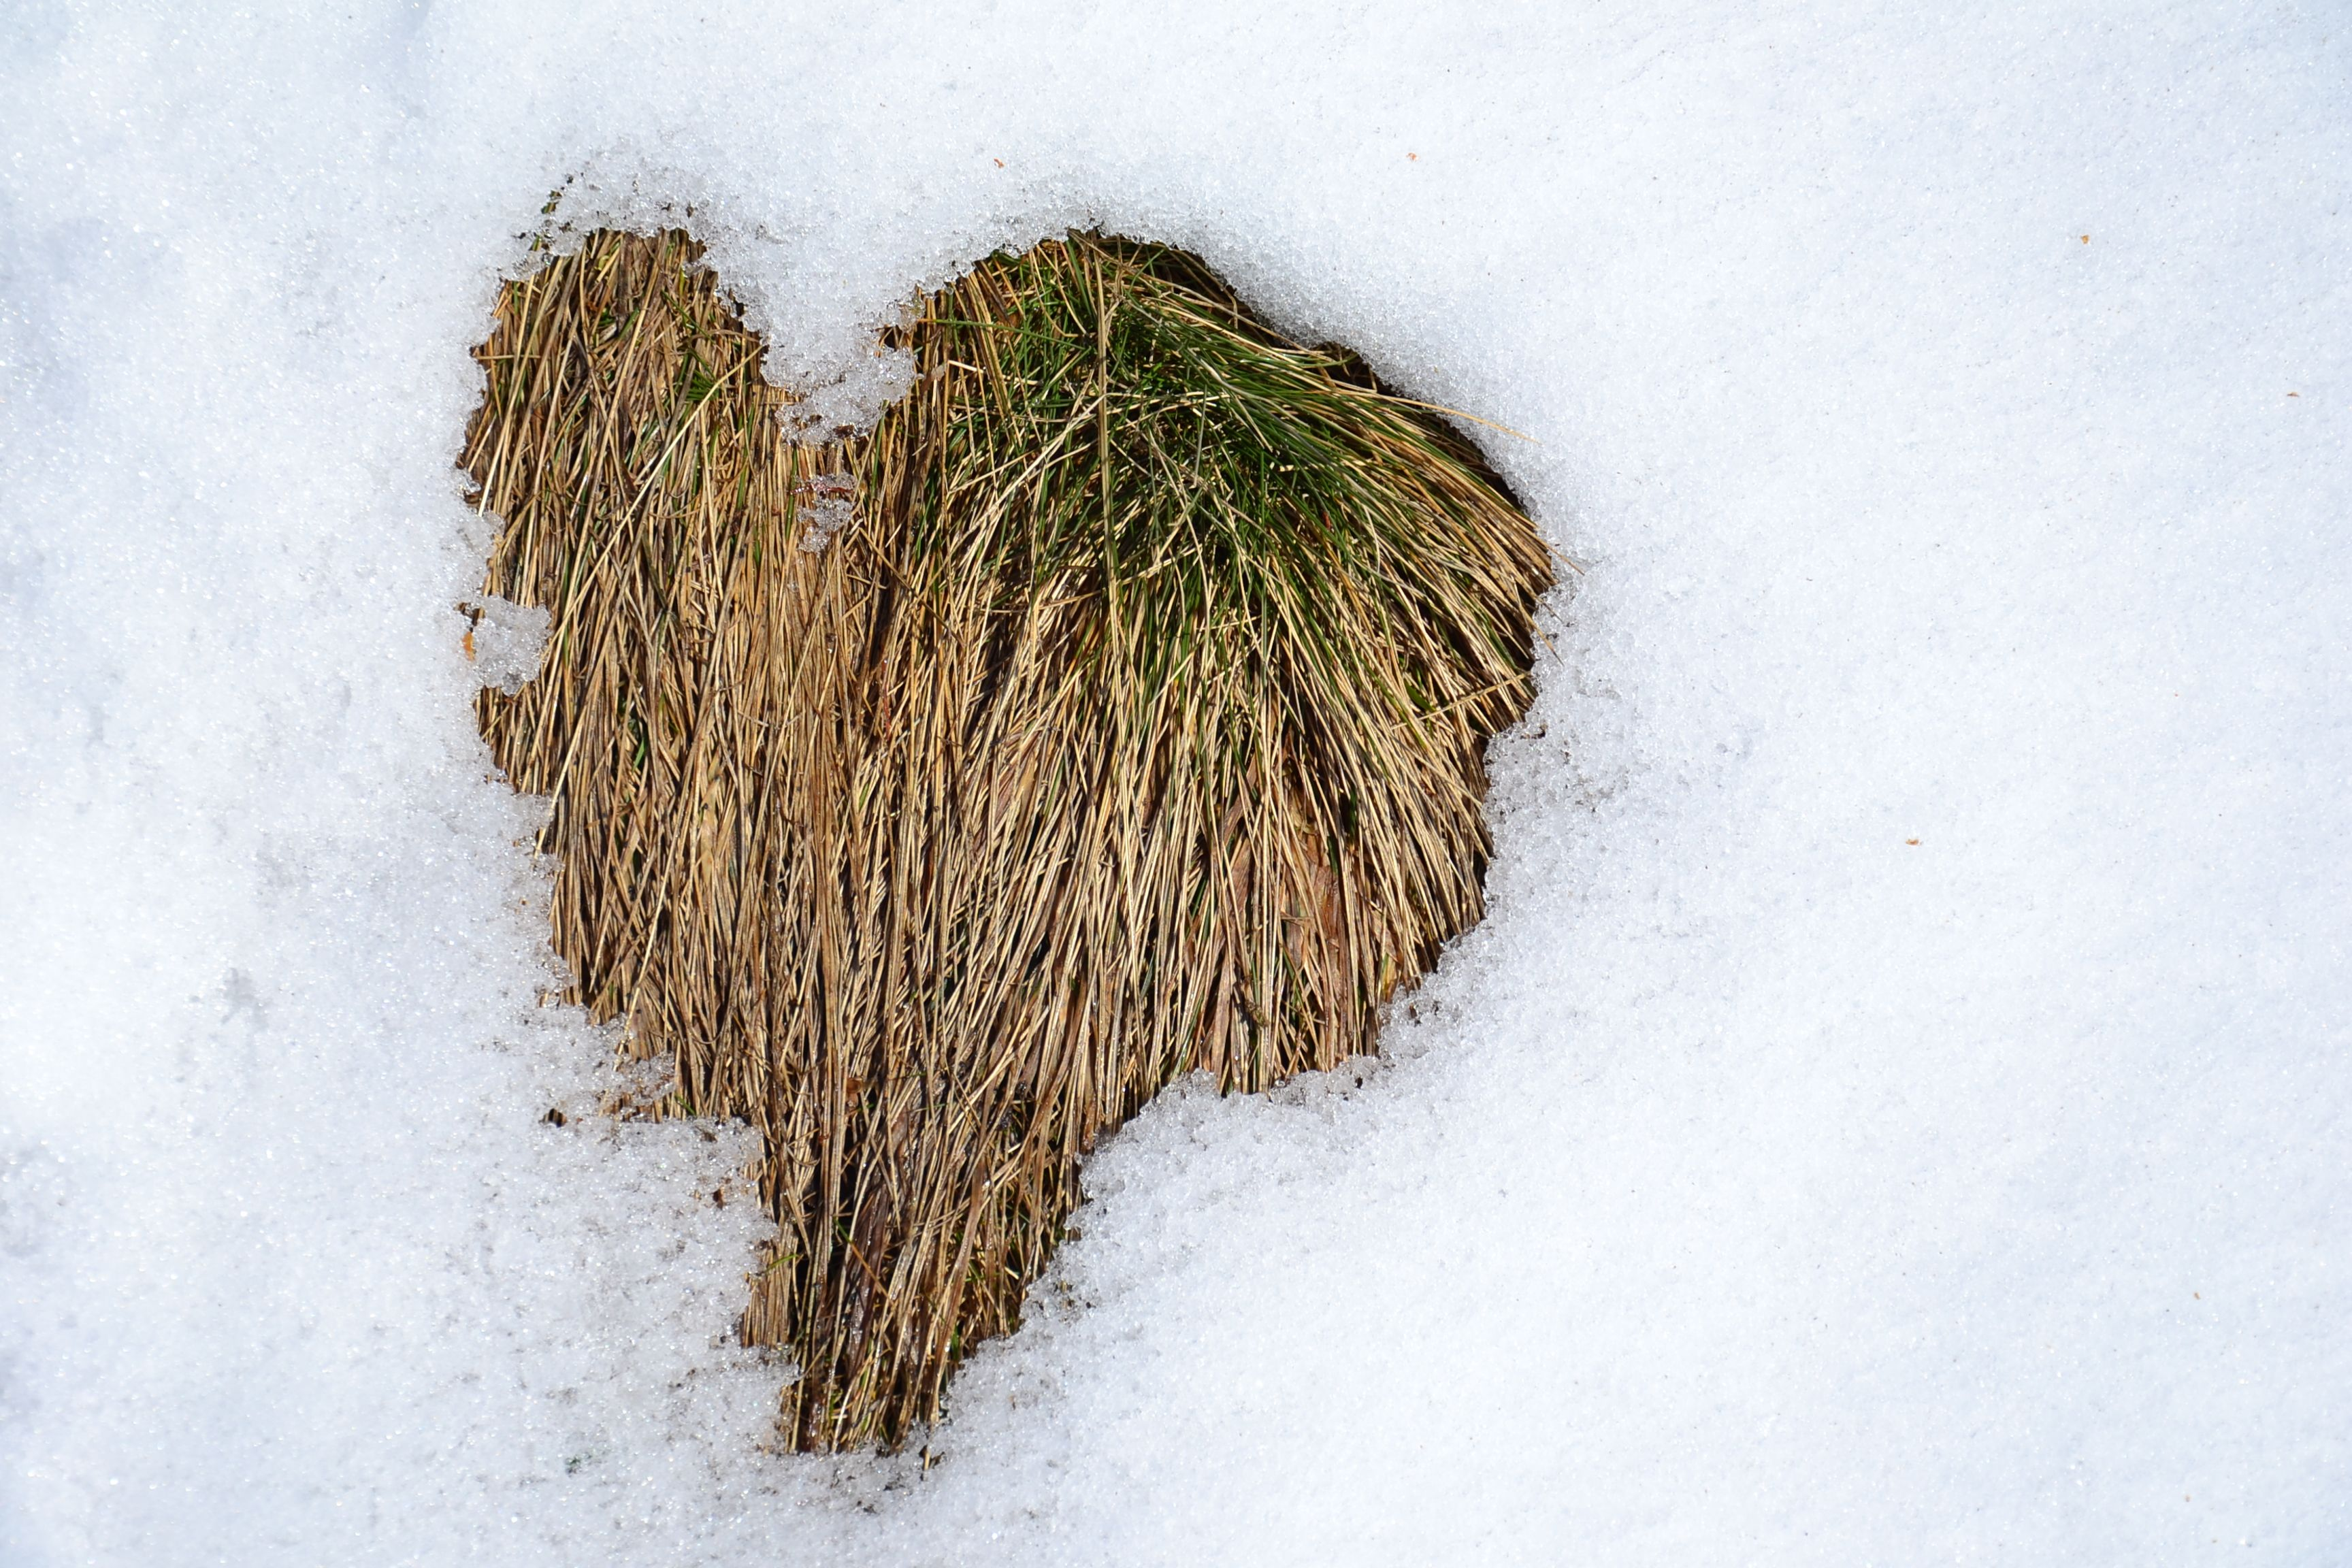 #Snow in #love!!  @M. Cervelli